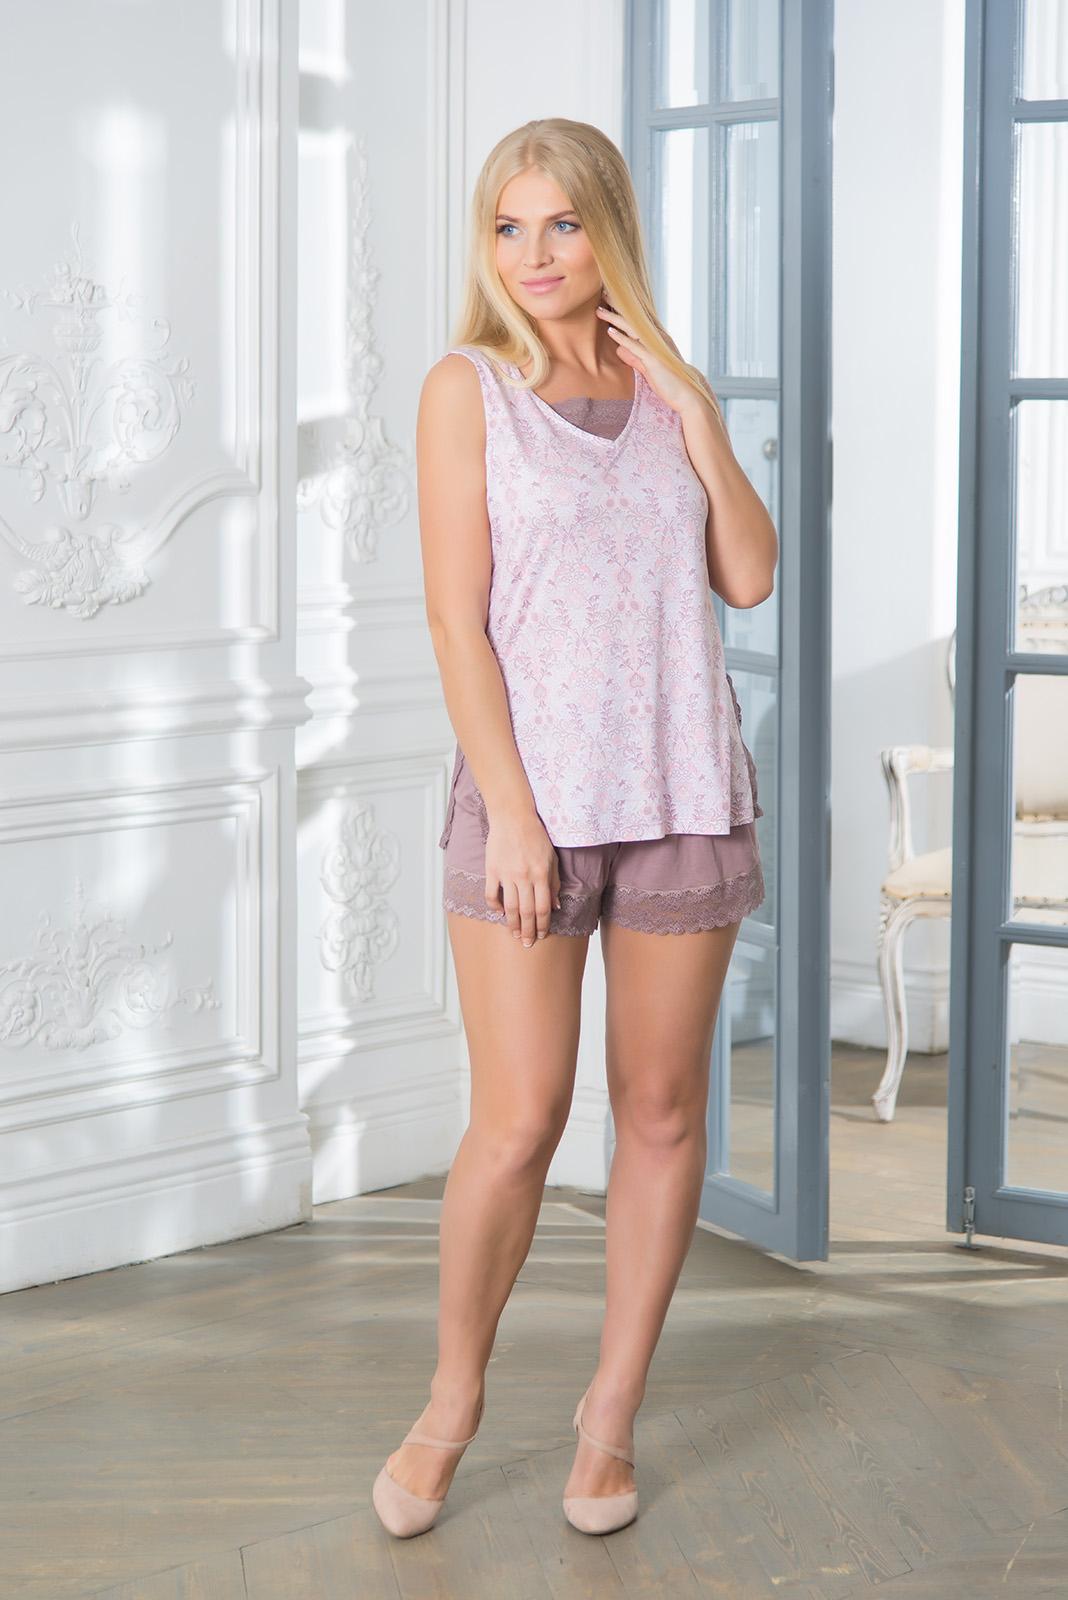 Пижамы Mia Cara Пижама Paulina Цвет: Сиреневый (S) пижамы mia cara пижама paisley цвет розовый m l